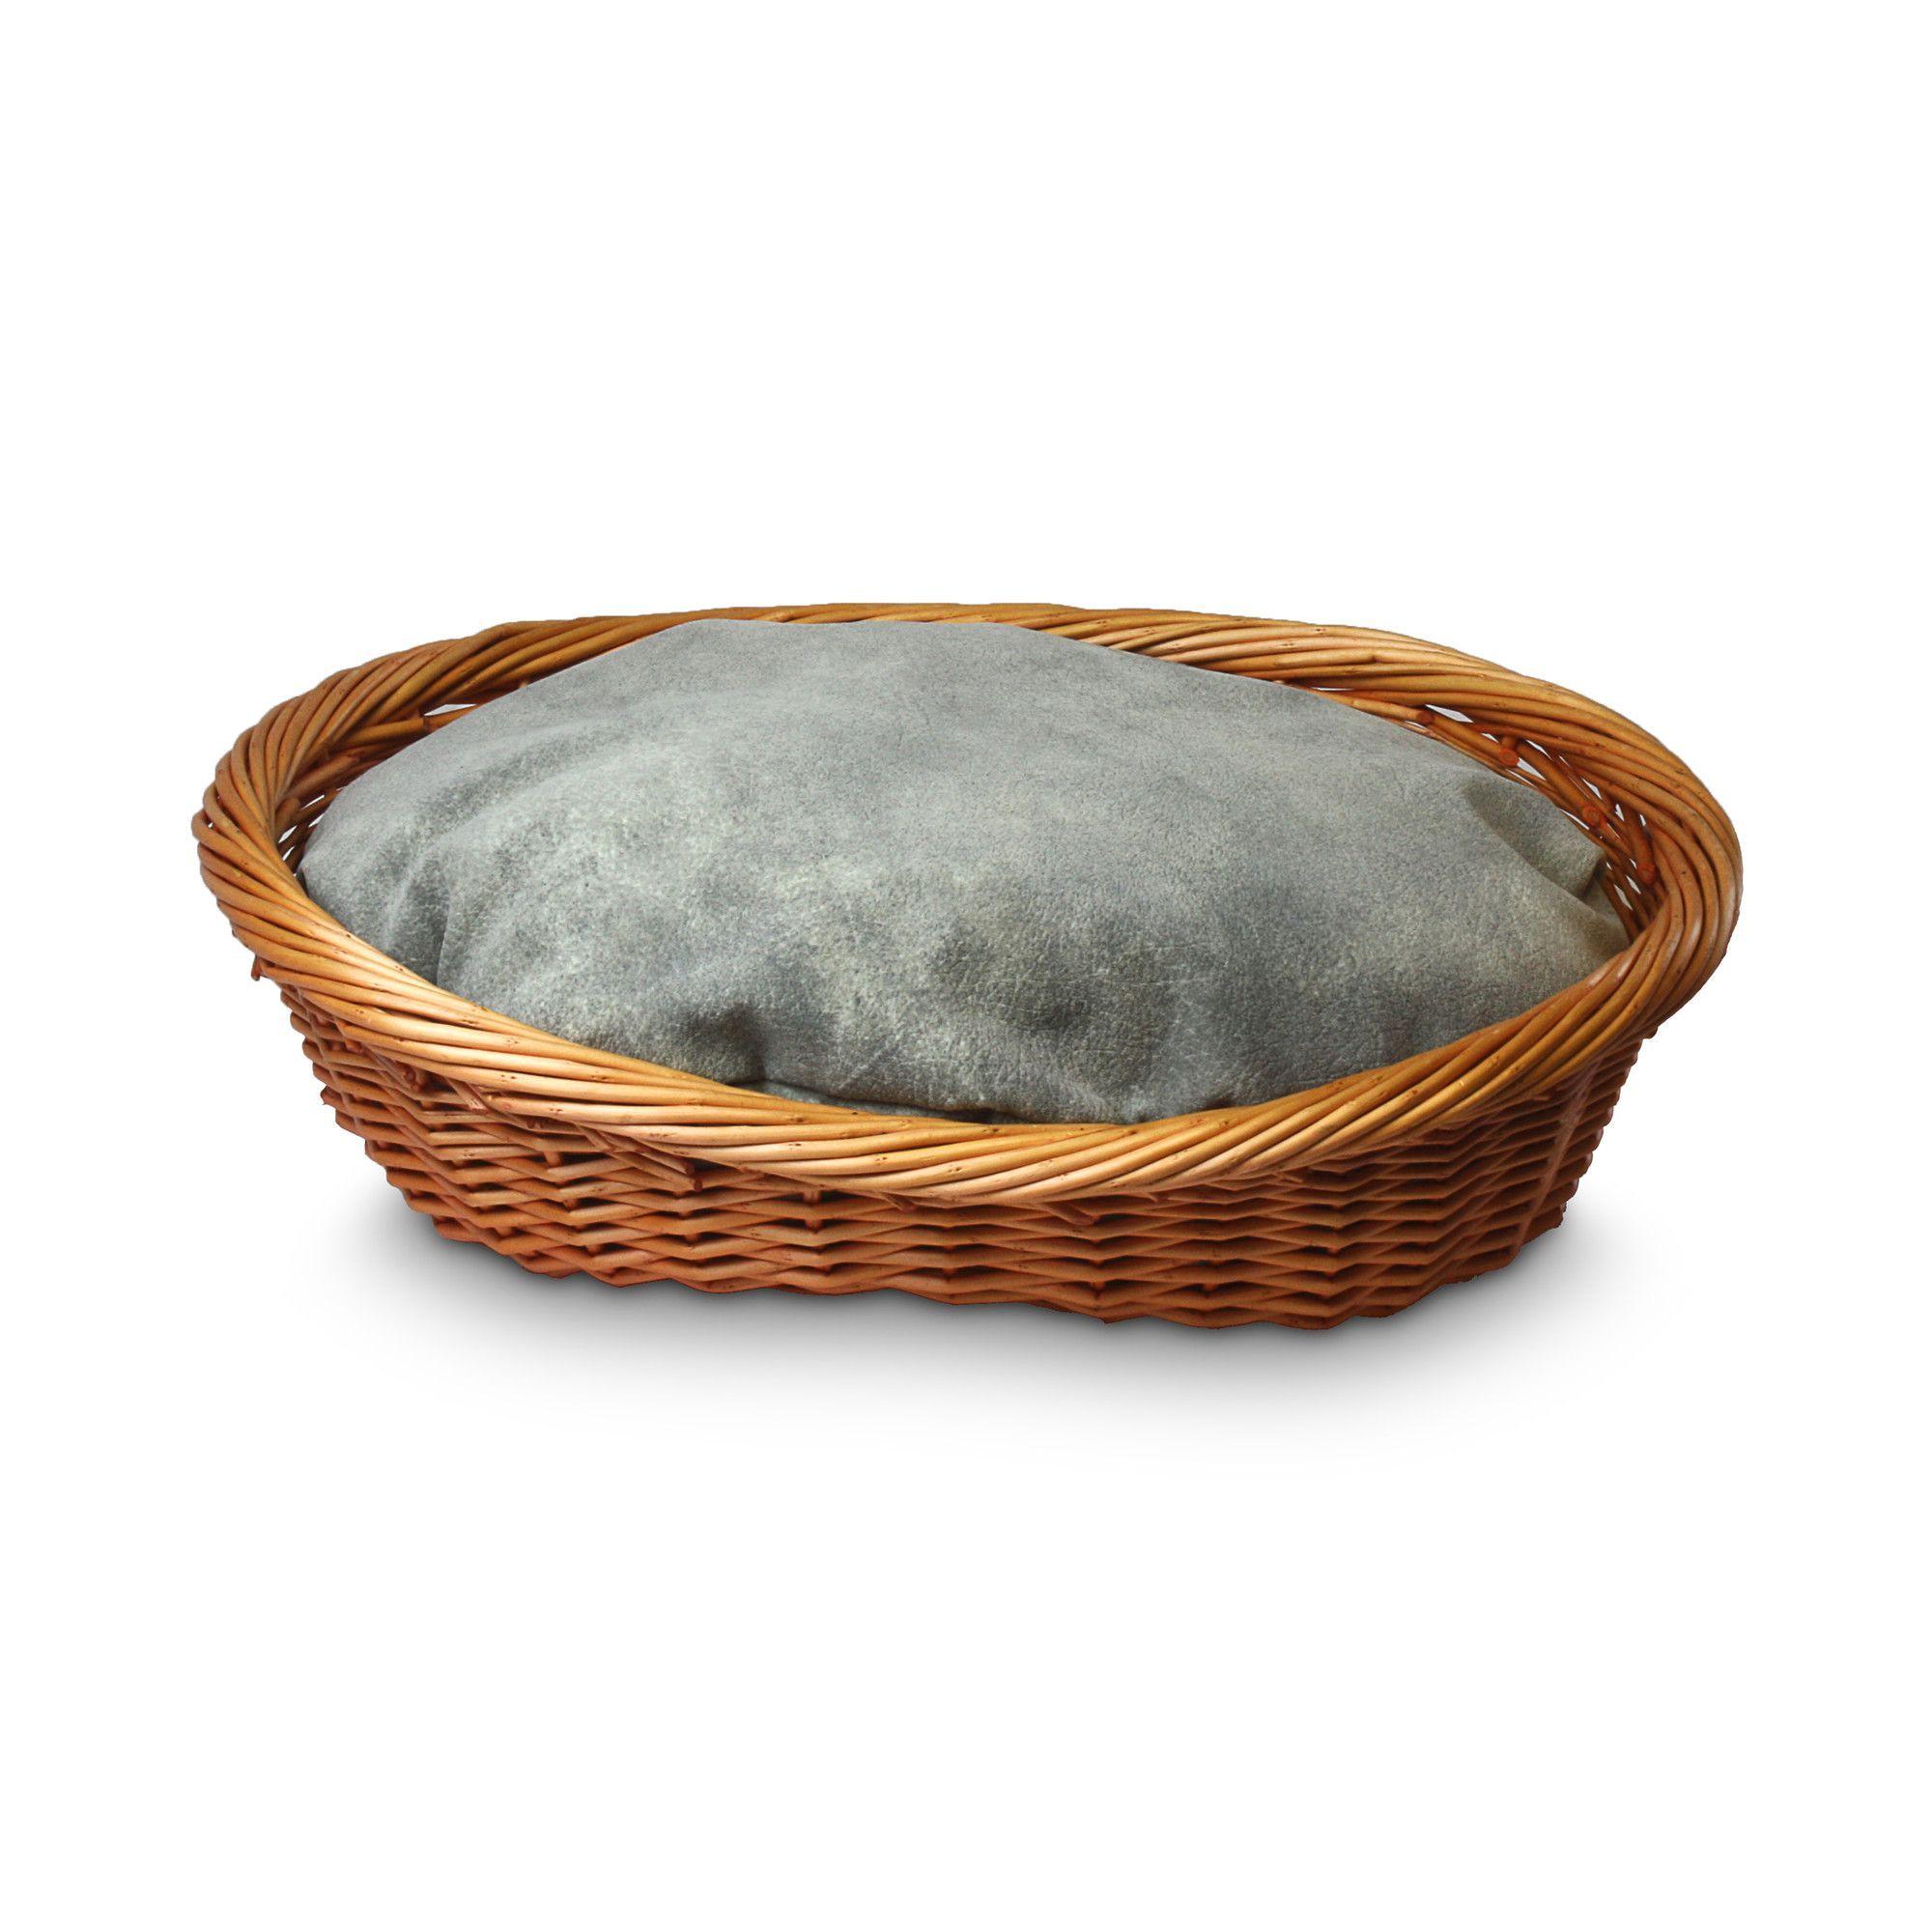 Luxury Wicker Dog Basket and Bed Dog bed, Wicker, Basket